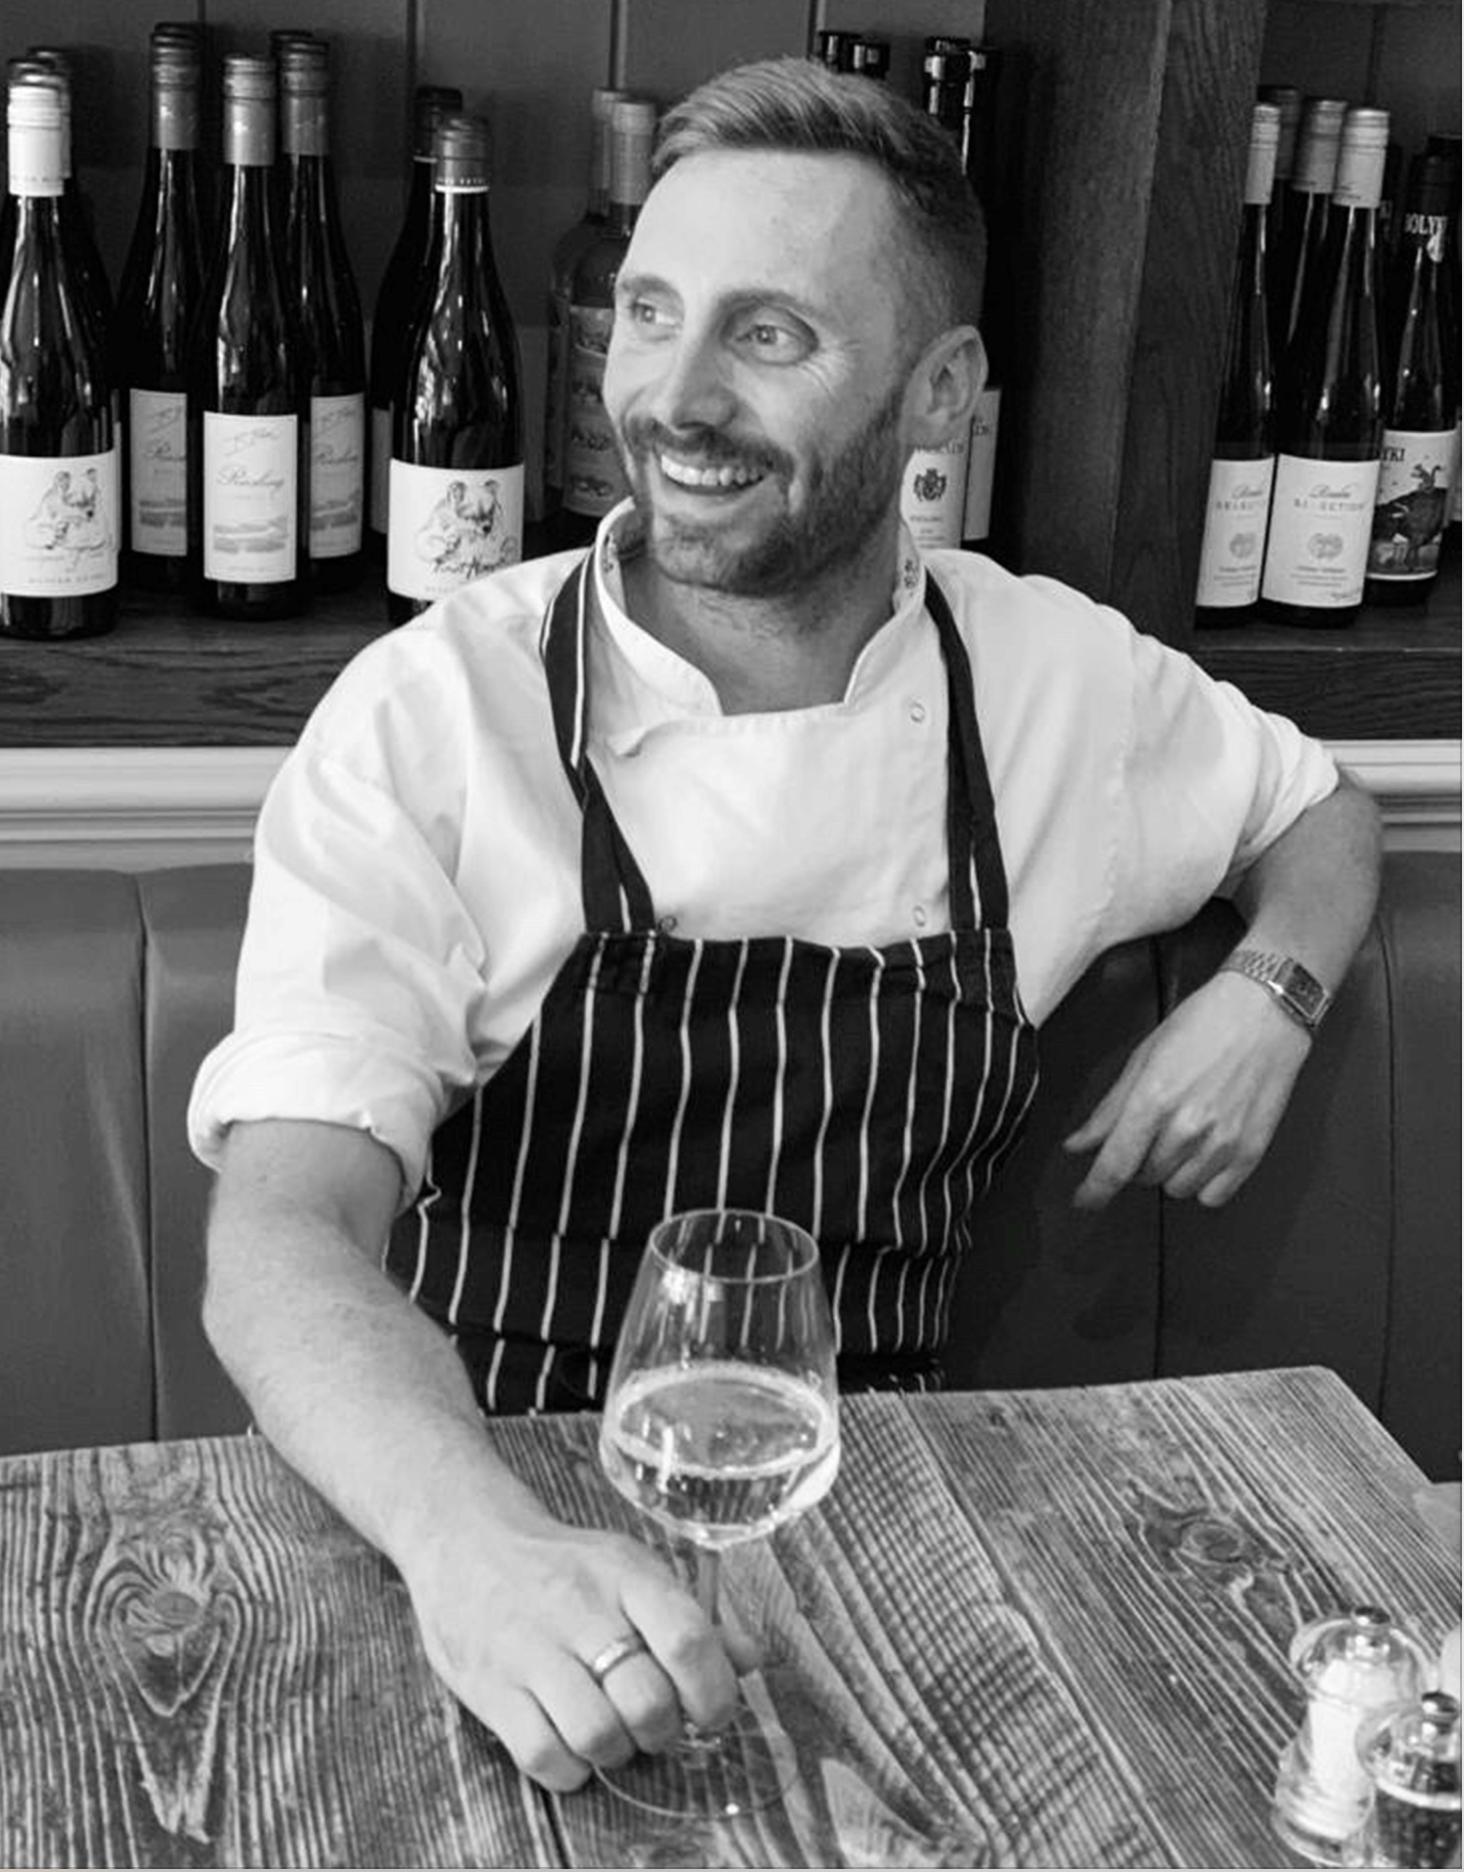 Tim Ingall, Head Chef